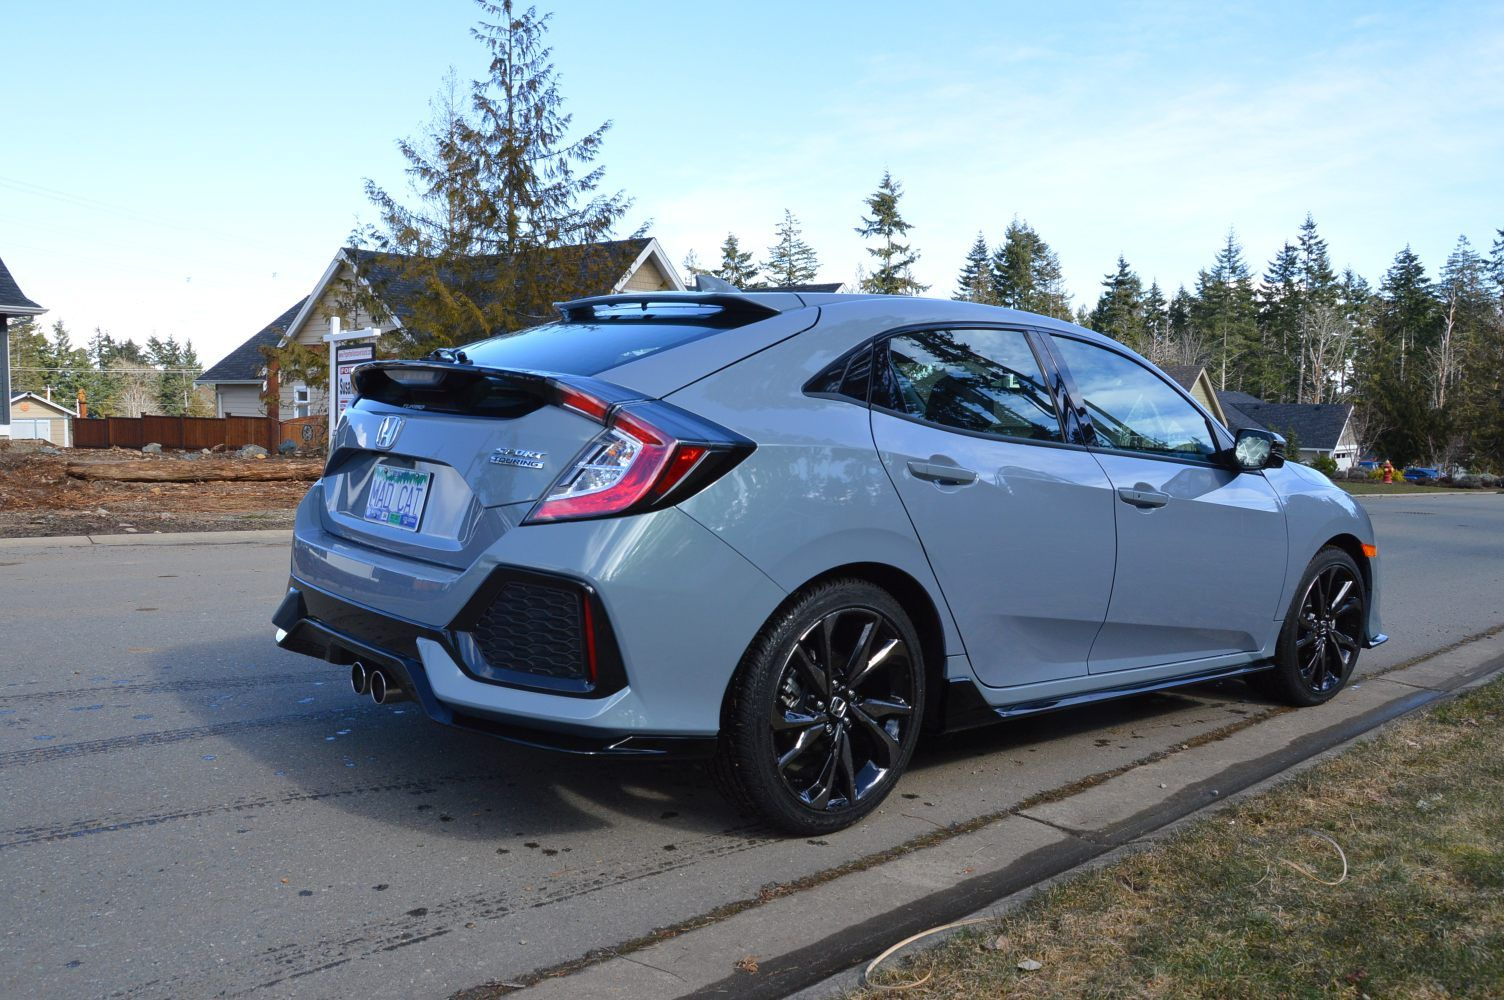 2018 Honda Civic Hatchback Sport 1 5 Turbo Sonic Gray Pearl Honda Civic Hatchback Honda Hatchback Civic Hatchback